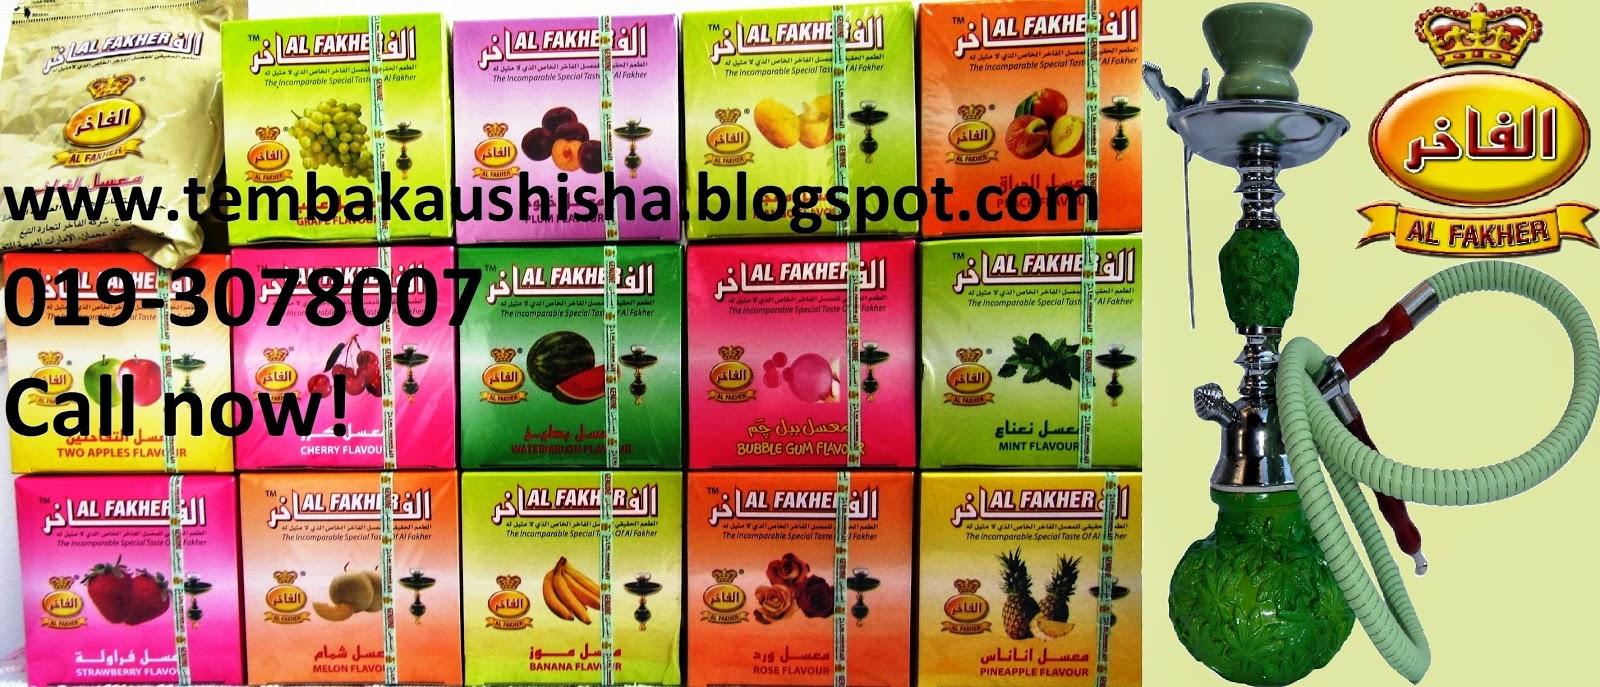 Pengimport Pembekal Pemborong Pengedar Flavor Shisha Al Fakher Dan Tembakau Melon Smooth Fresh Pengimpot Flavour Molasses Kuala Lumpur